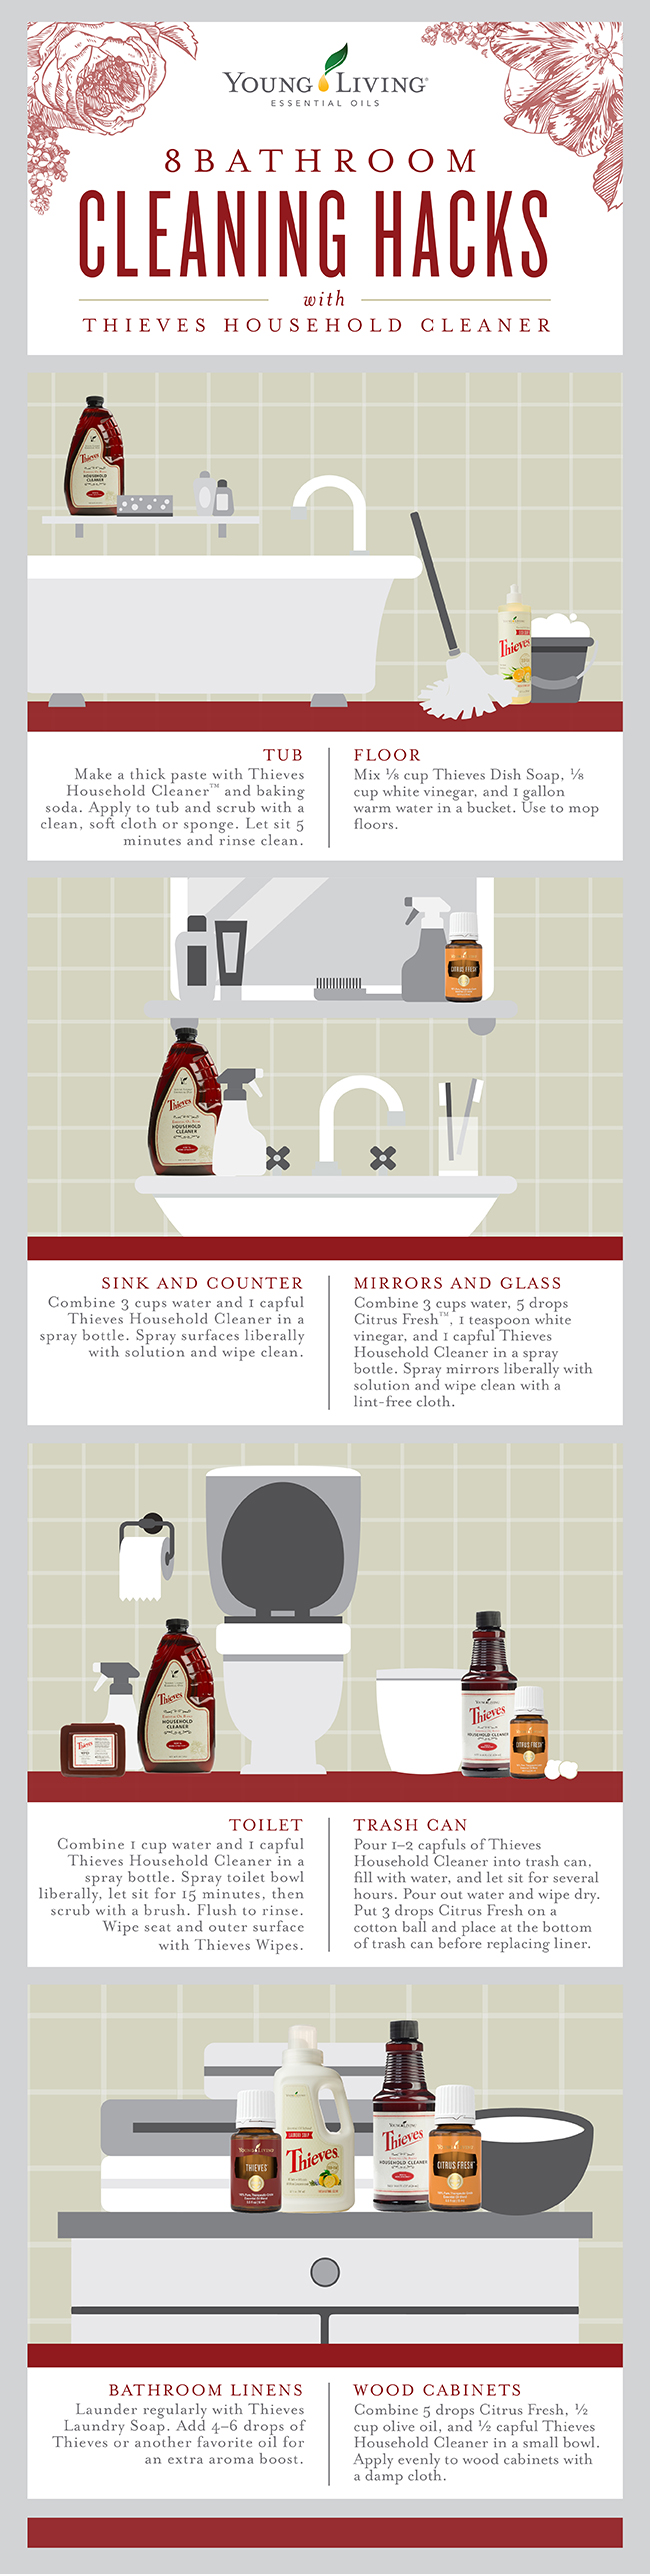 Blog-8-Bathroom-Cleaning-Hacks_Infographic_US-01.jpg